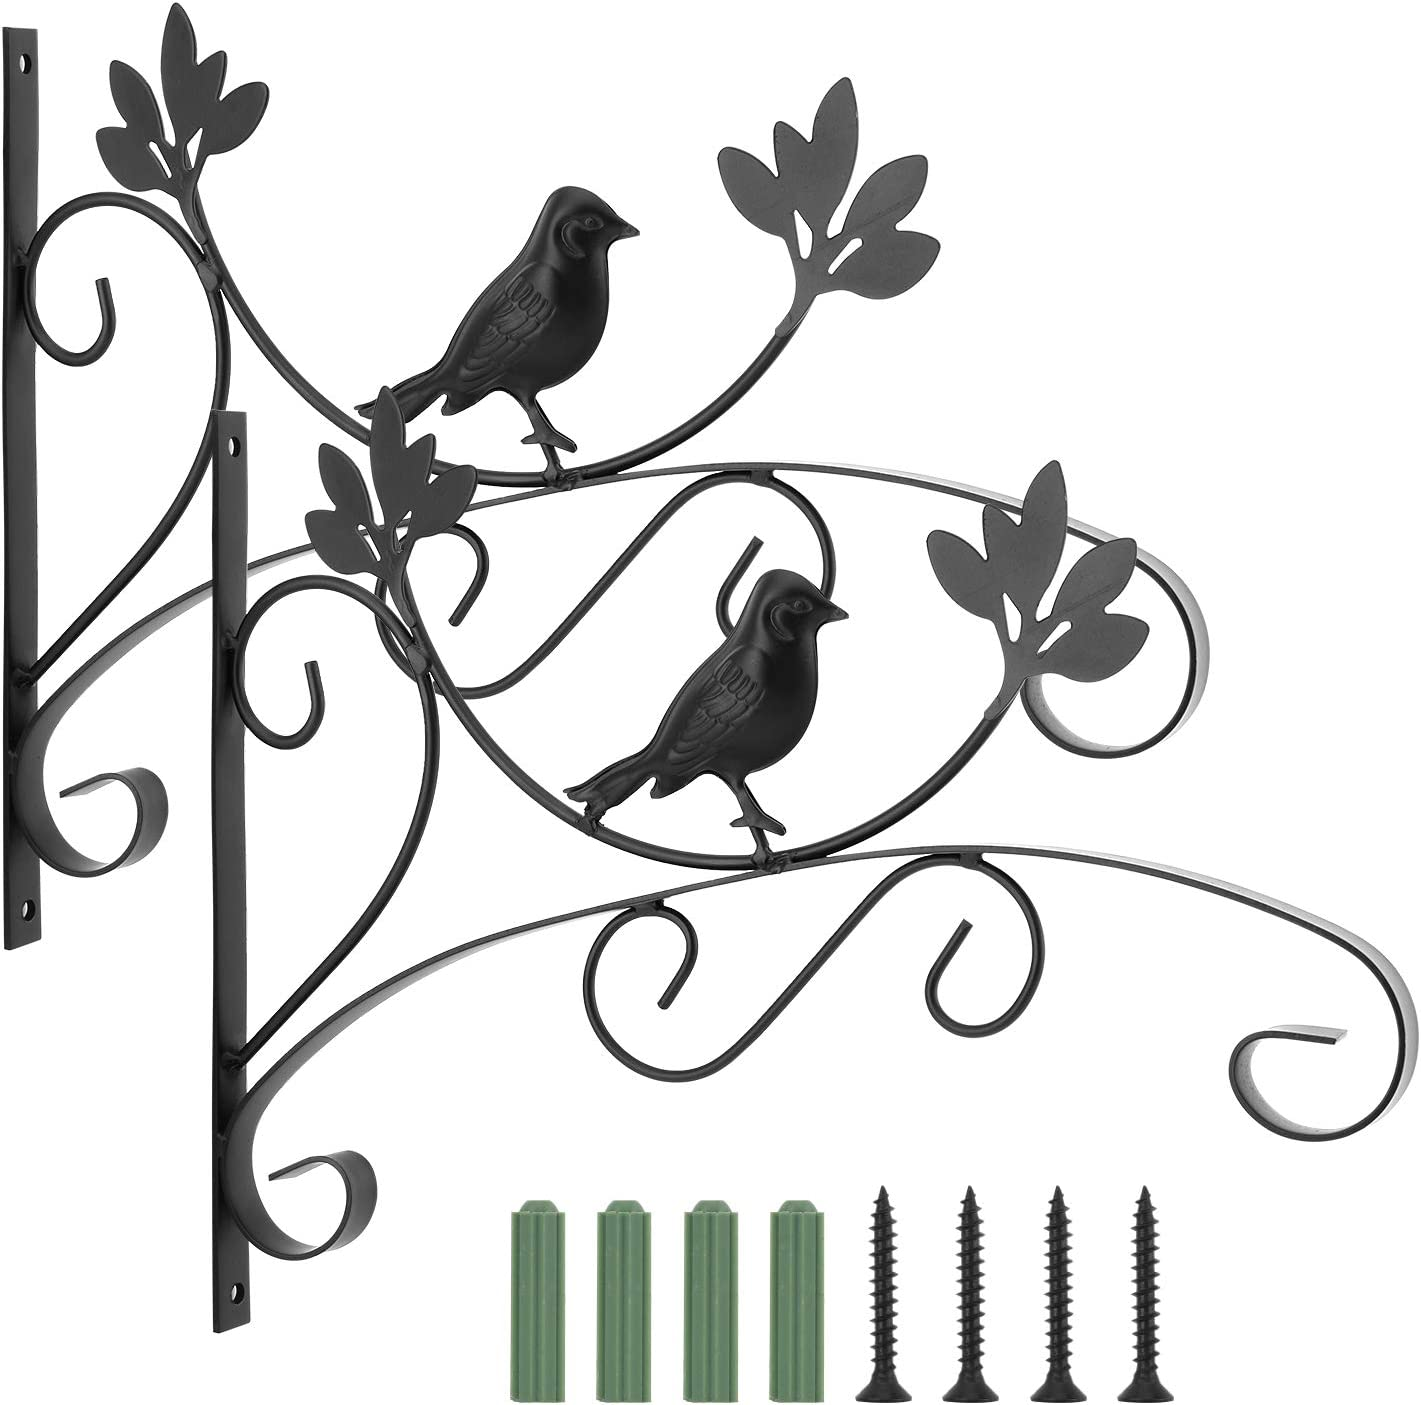 Lewondr Wall Hanging Plant Bracket, [2 Pack] 14 Inch Retro Outdoor Indoor Garden Hook Décor Alloy Decorative Plant Brackets with Screws for Bird Feeder Wind Chime Lantern, Bird 03 - Spray Paint Black